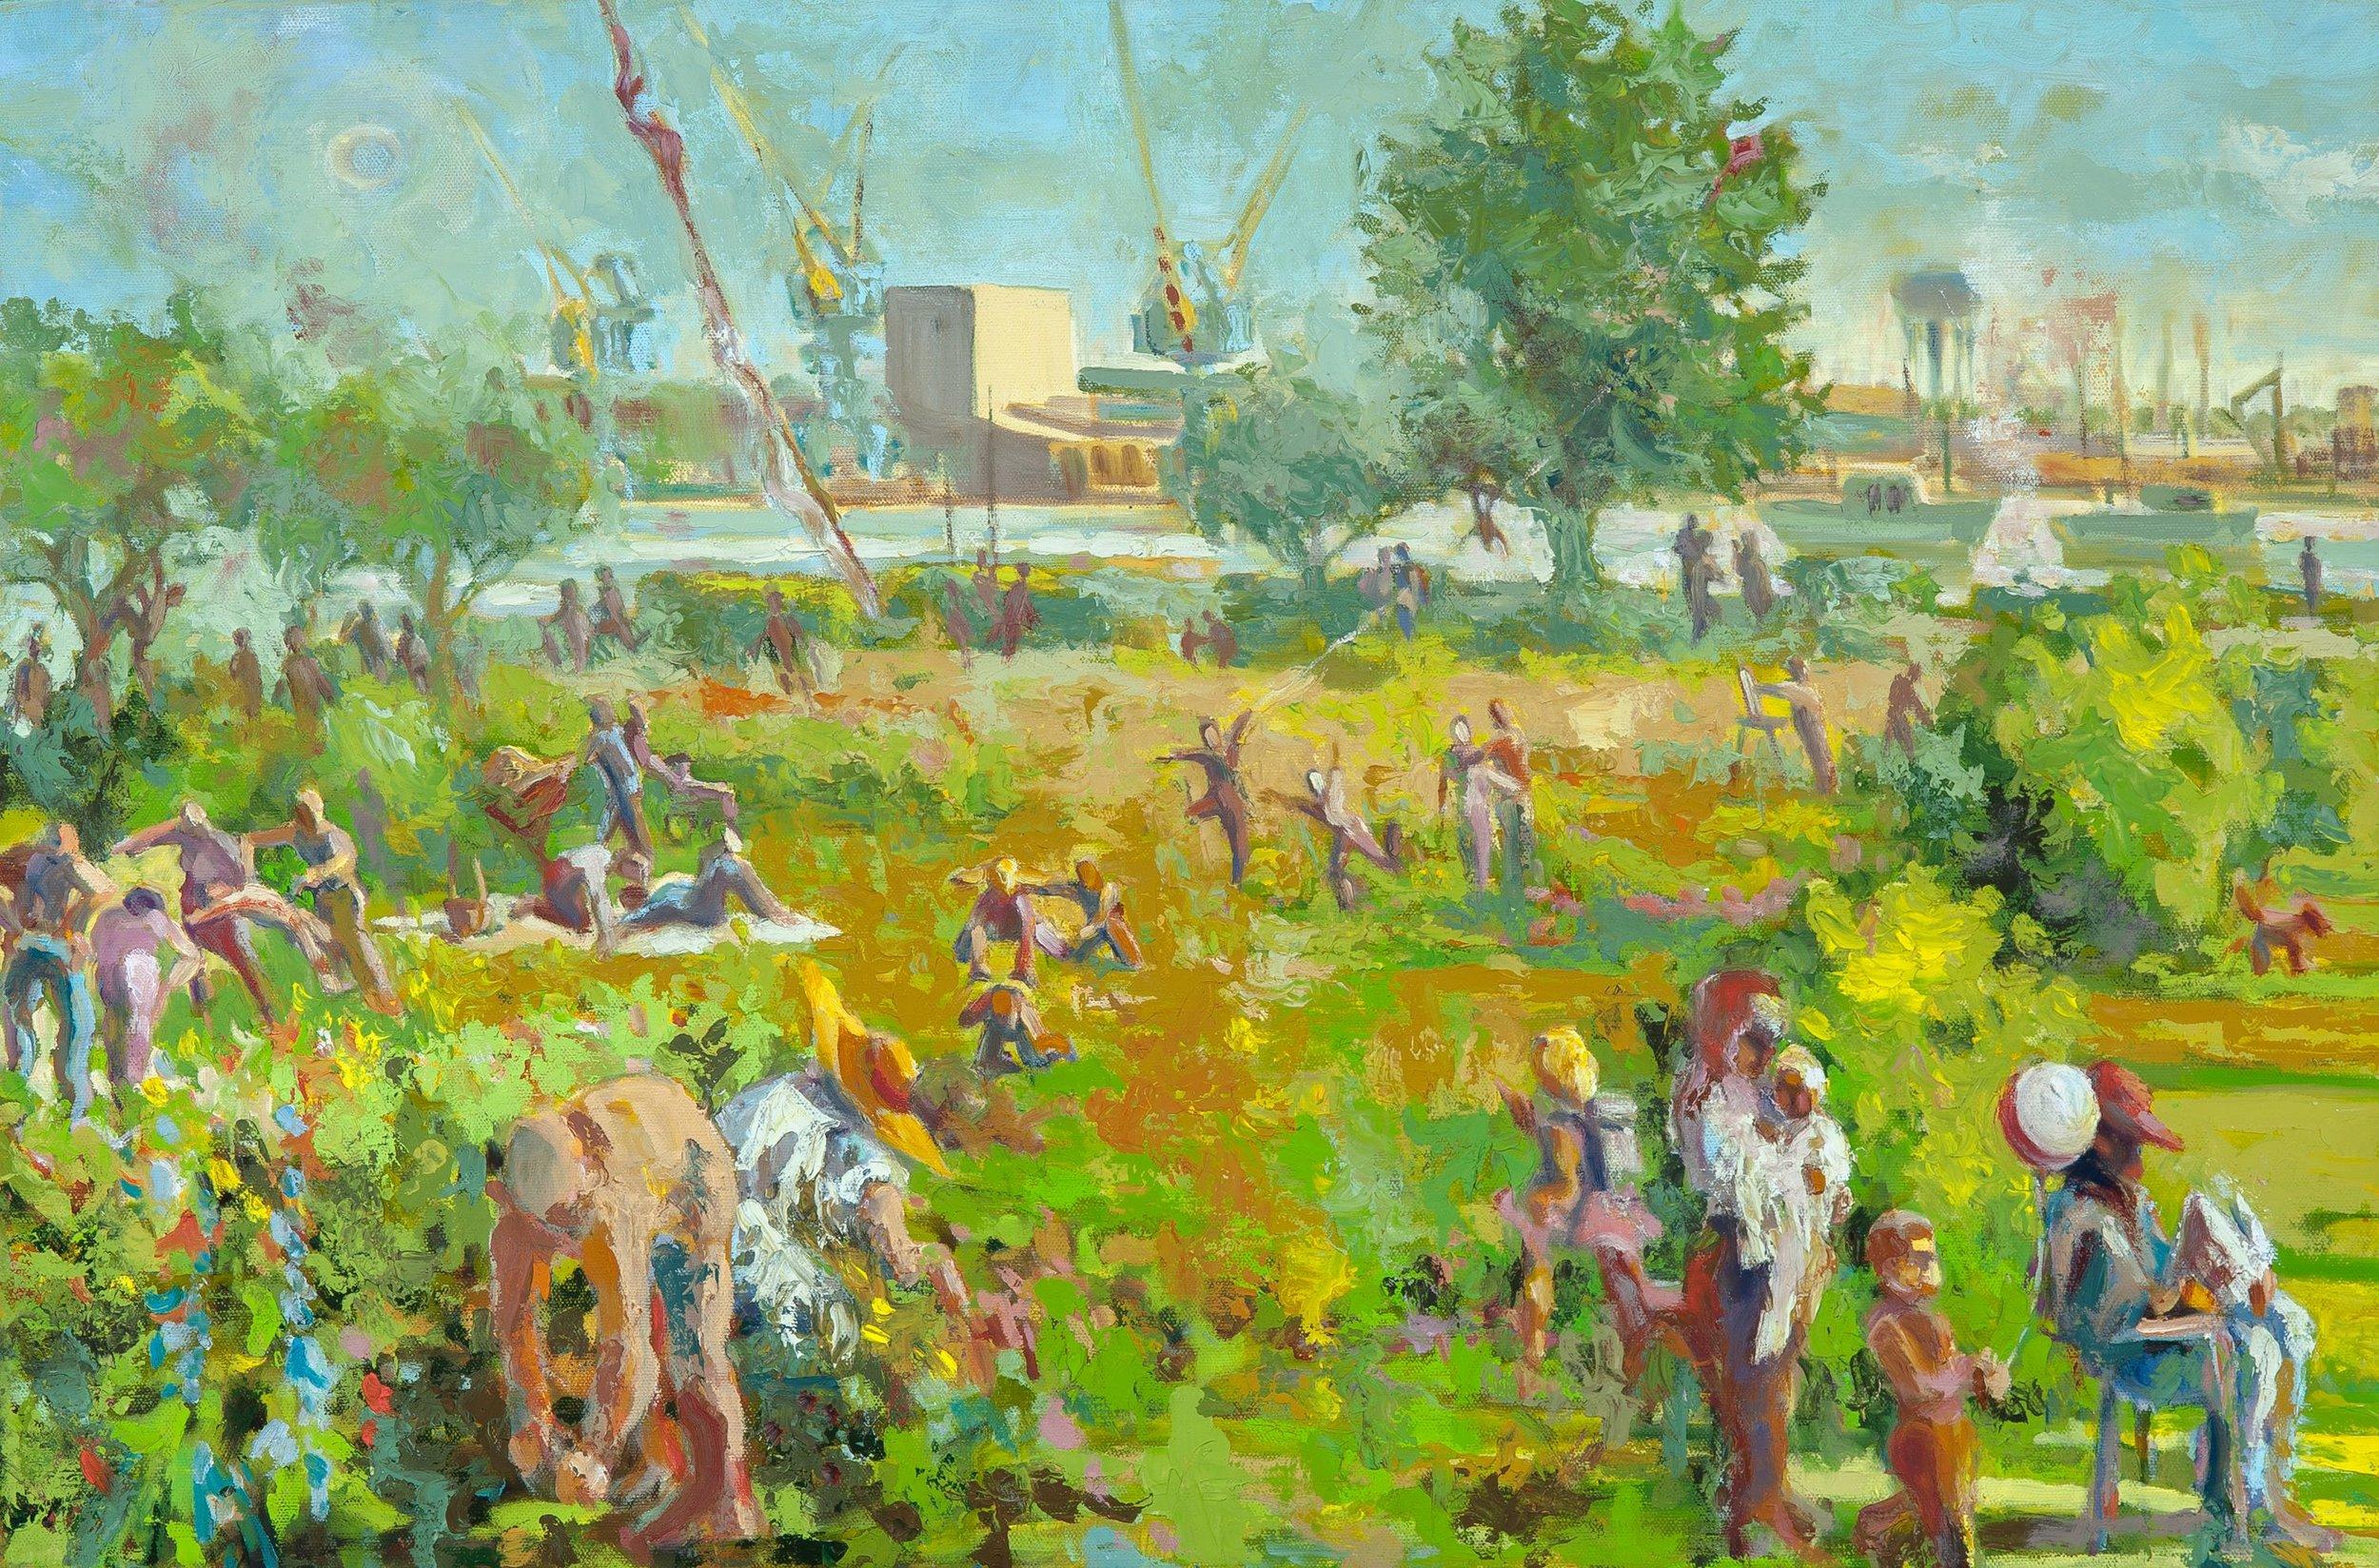 Child's Play, oils, 30 x 20